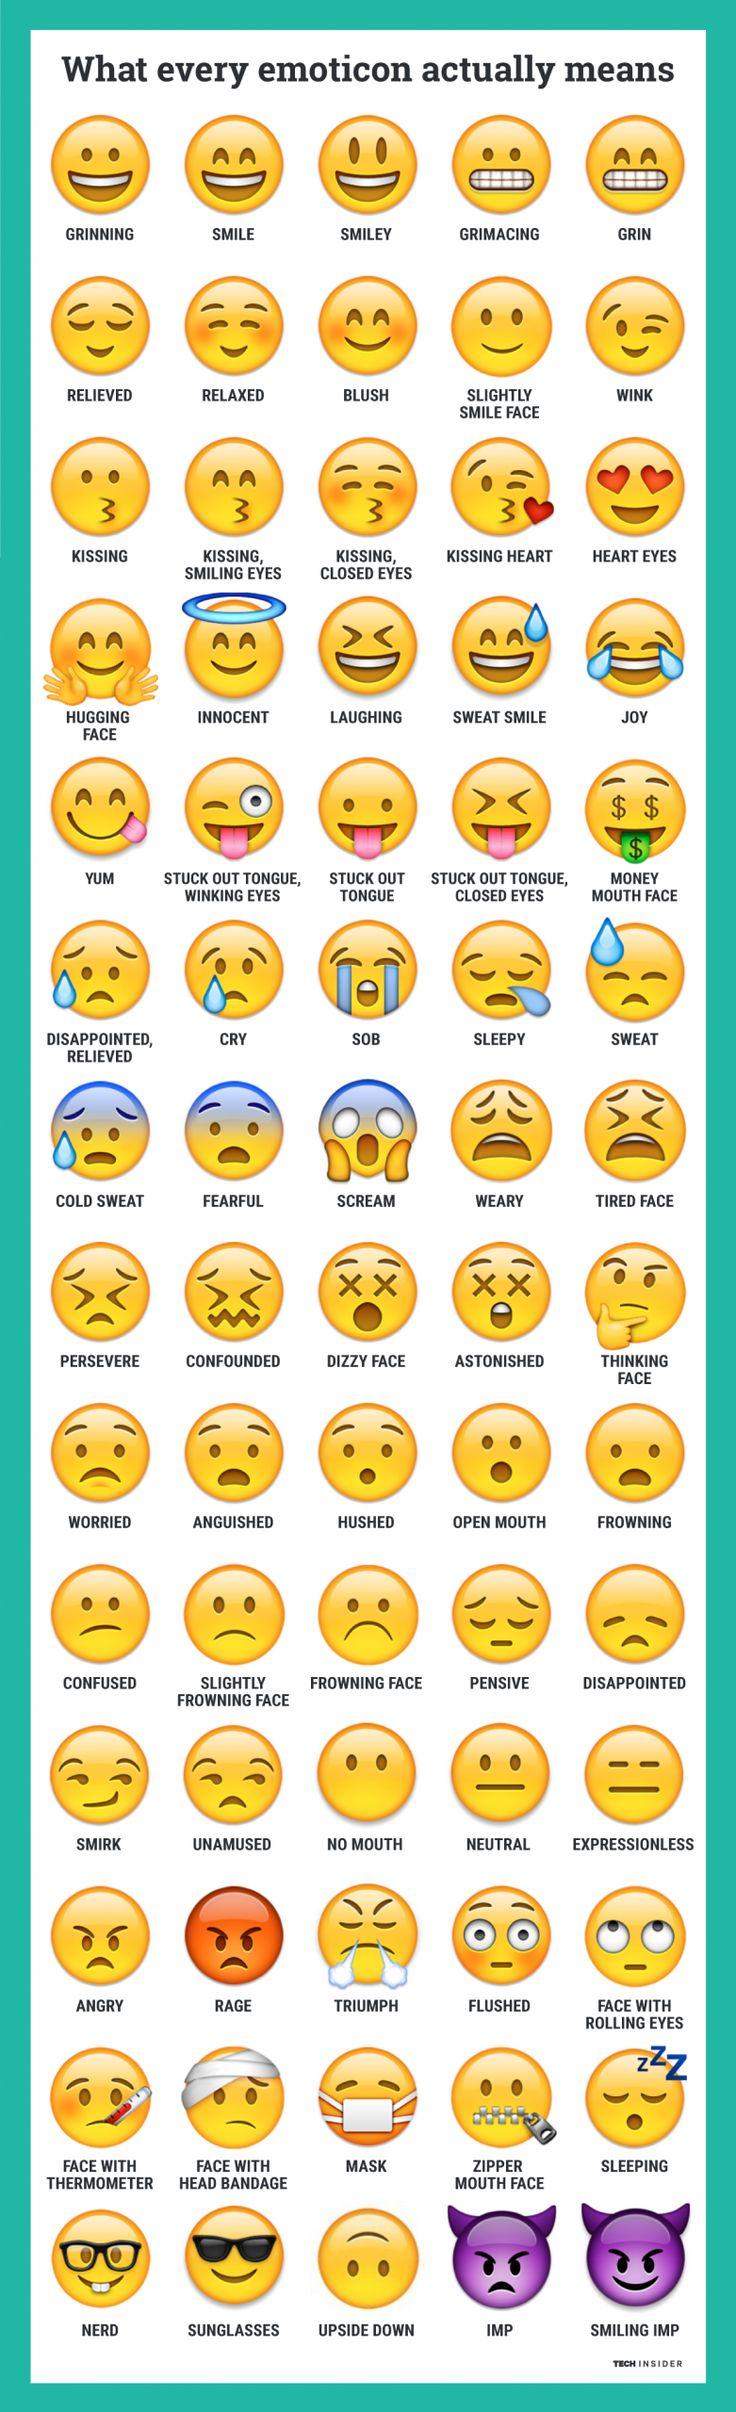 TI_Graphics_emoticons explained_1